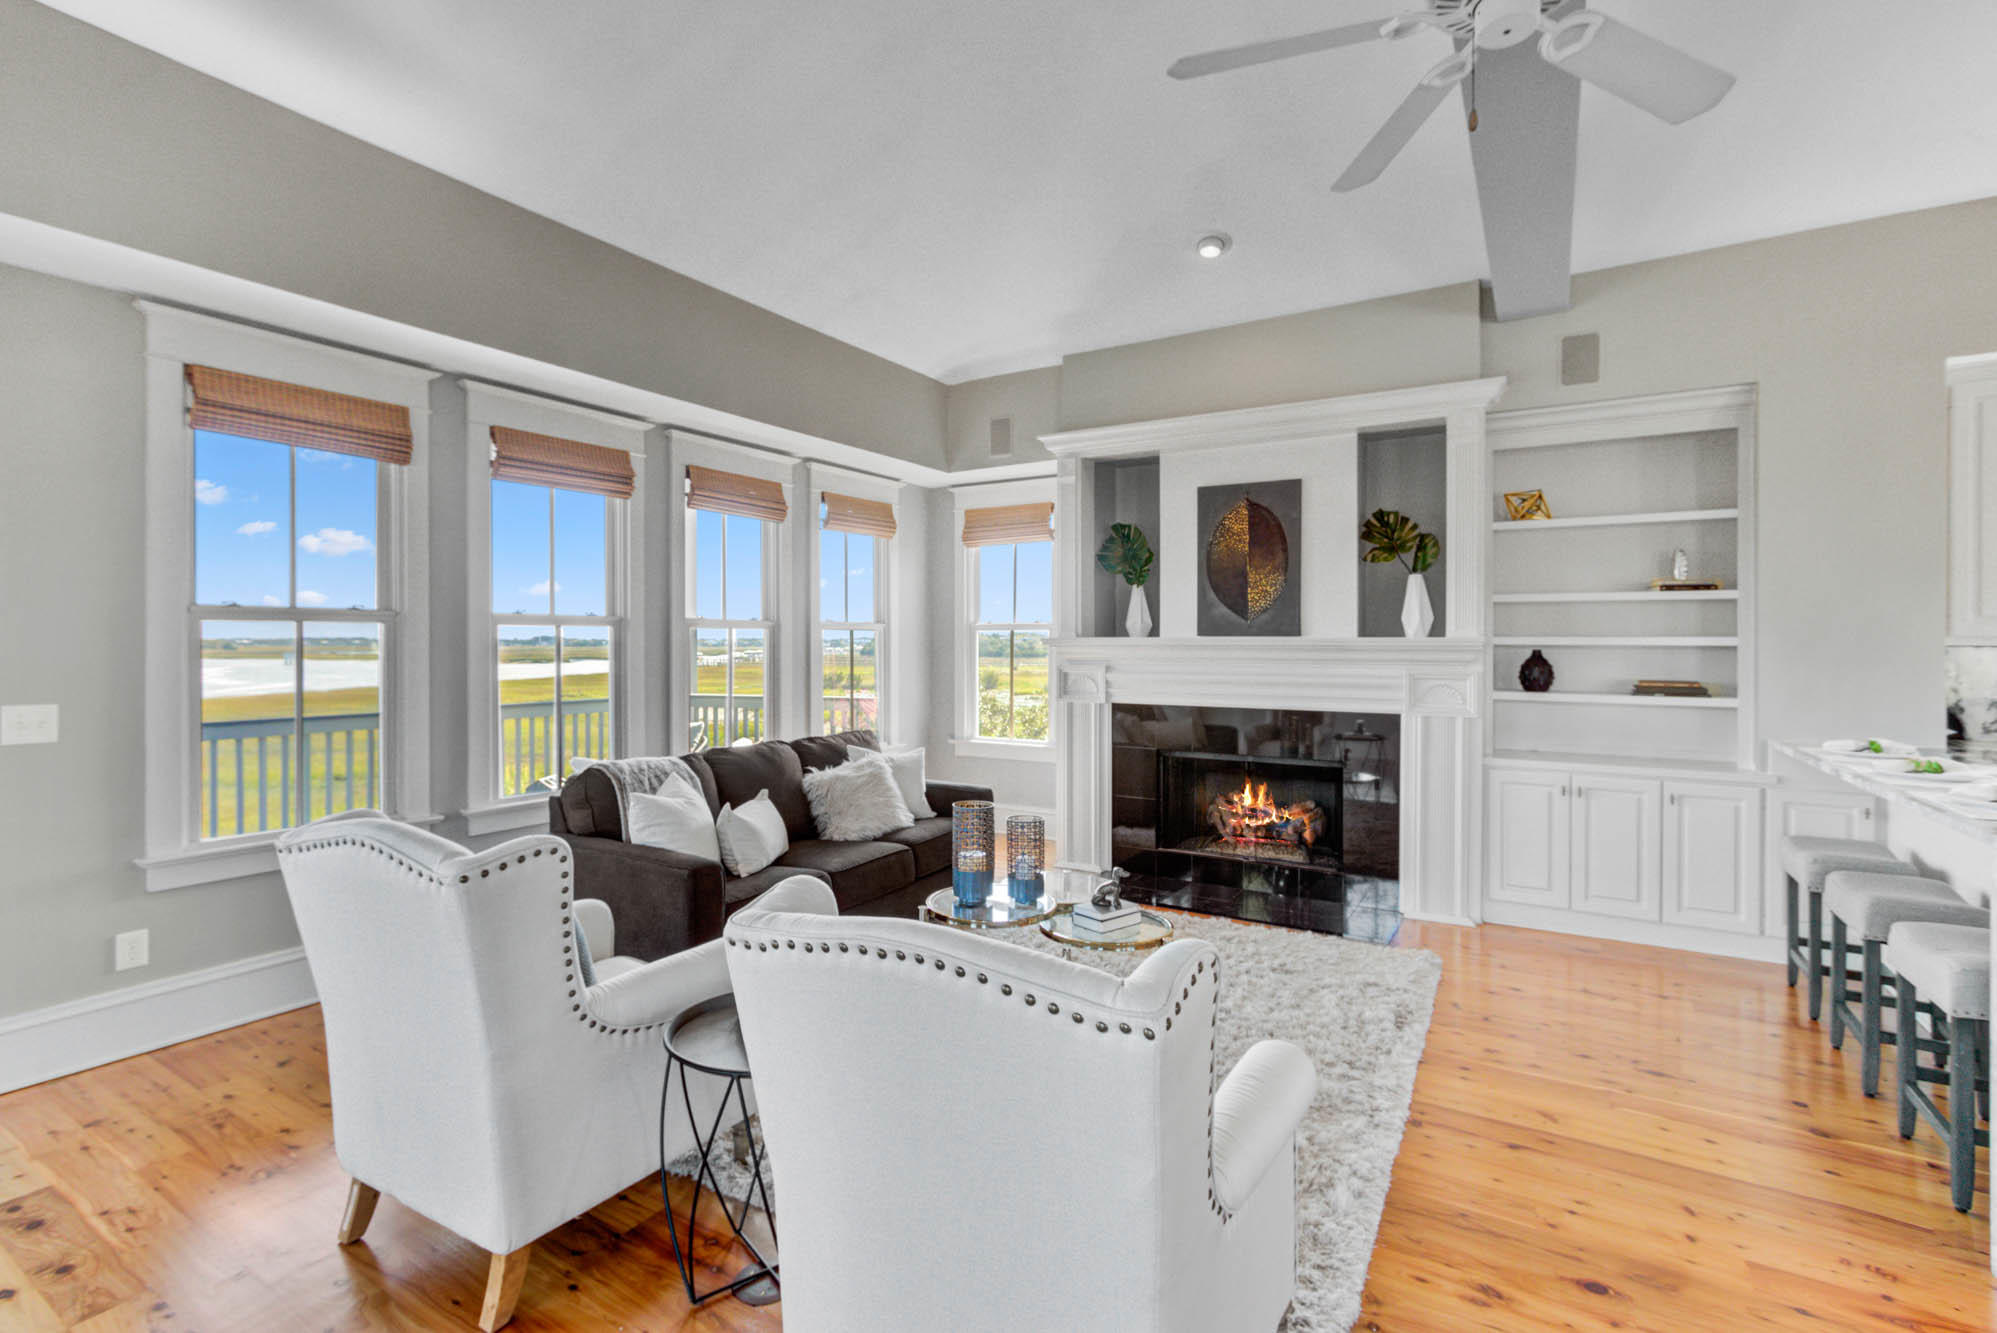 Sullivans Island Homes For Sale - 904 Middle, Sullivans Island, SC - 41